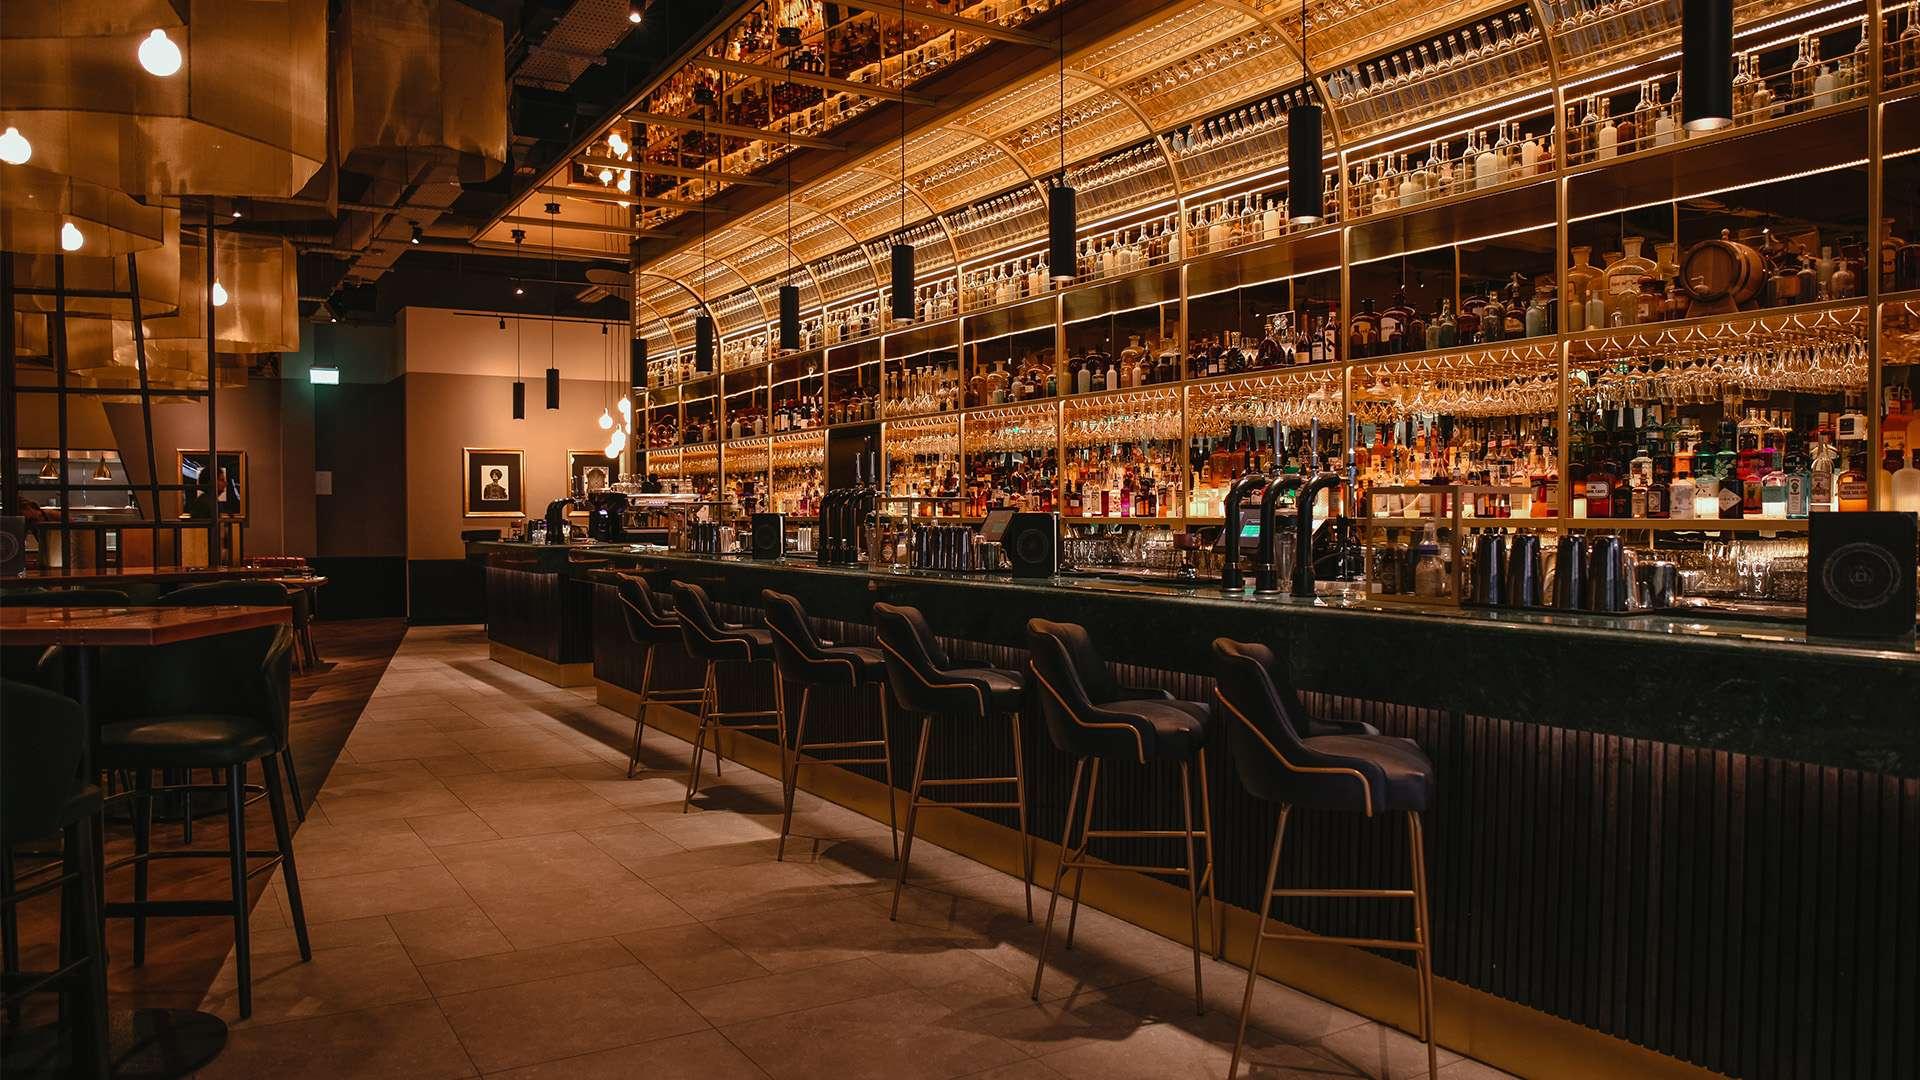 The Alchemist shortlisted for Restaurant & Bar Design Award